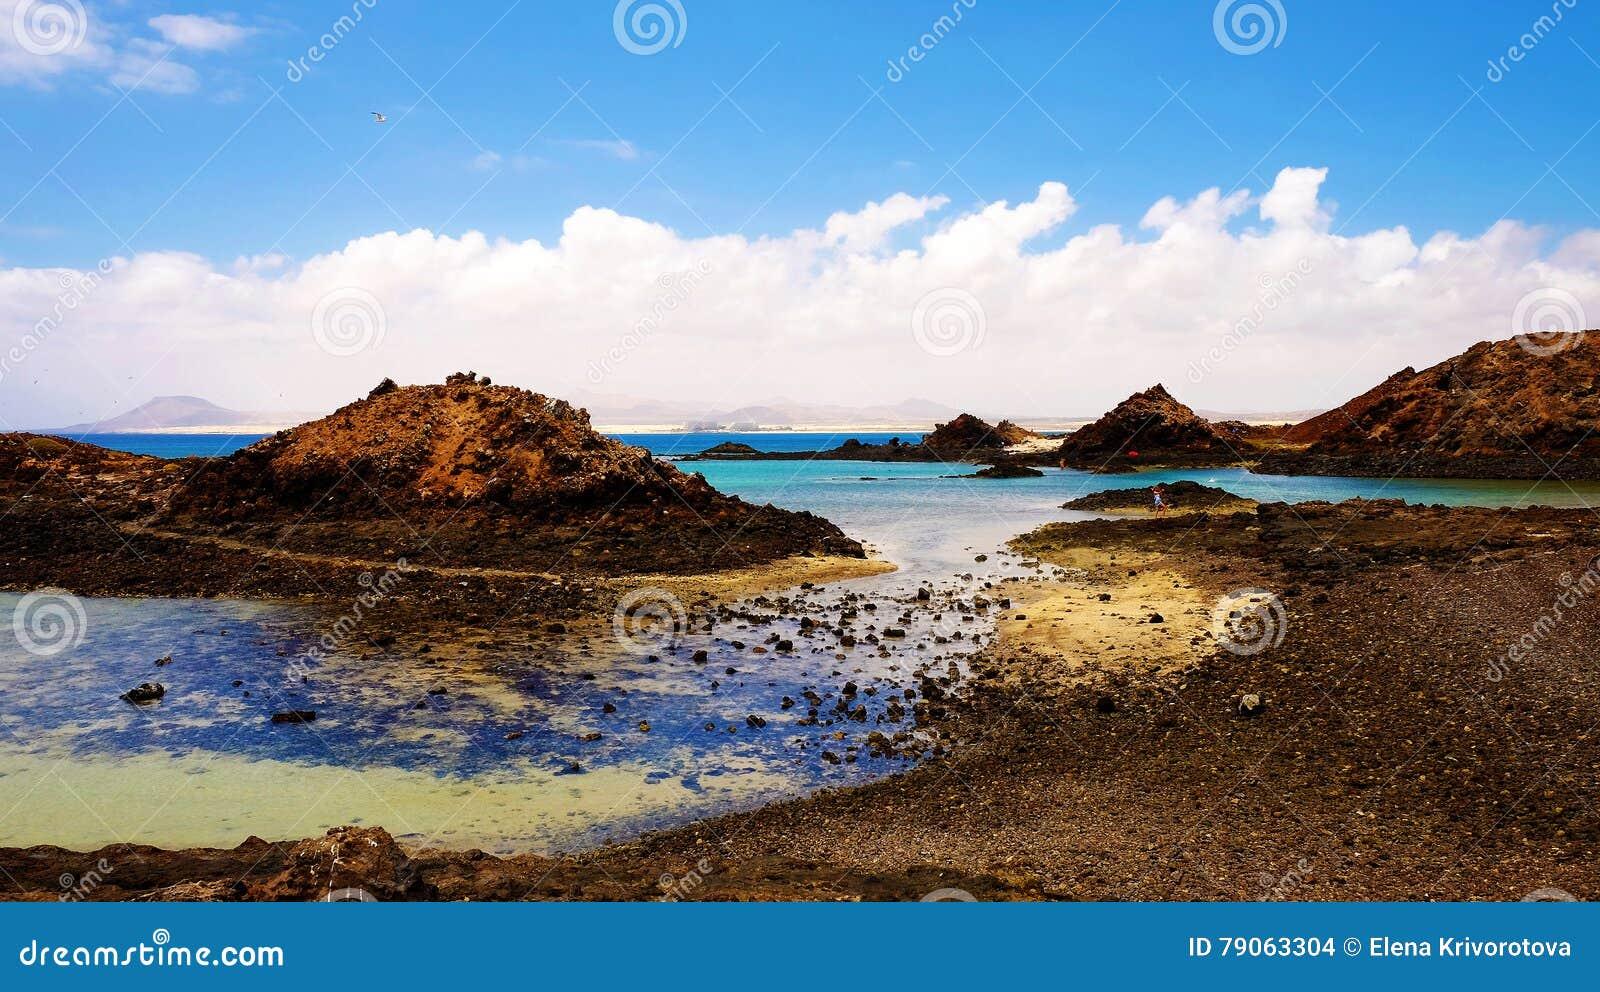 Blaue Lagune Auf Der Insel Lobos, Fuerteventura, Spanien Stockfoto ...